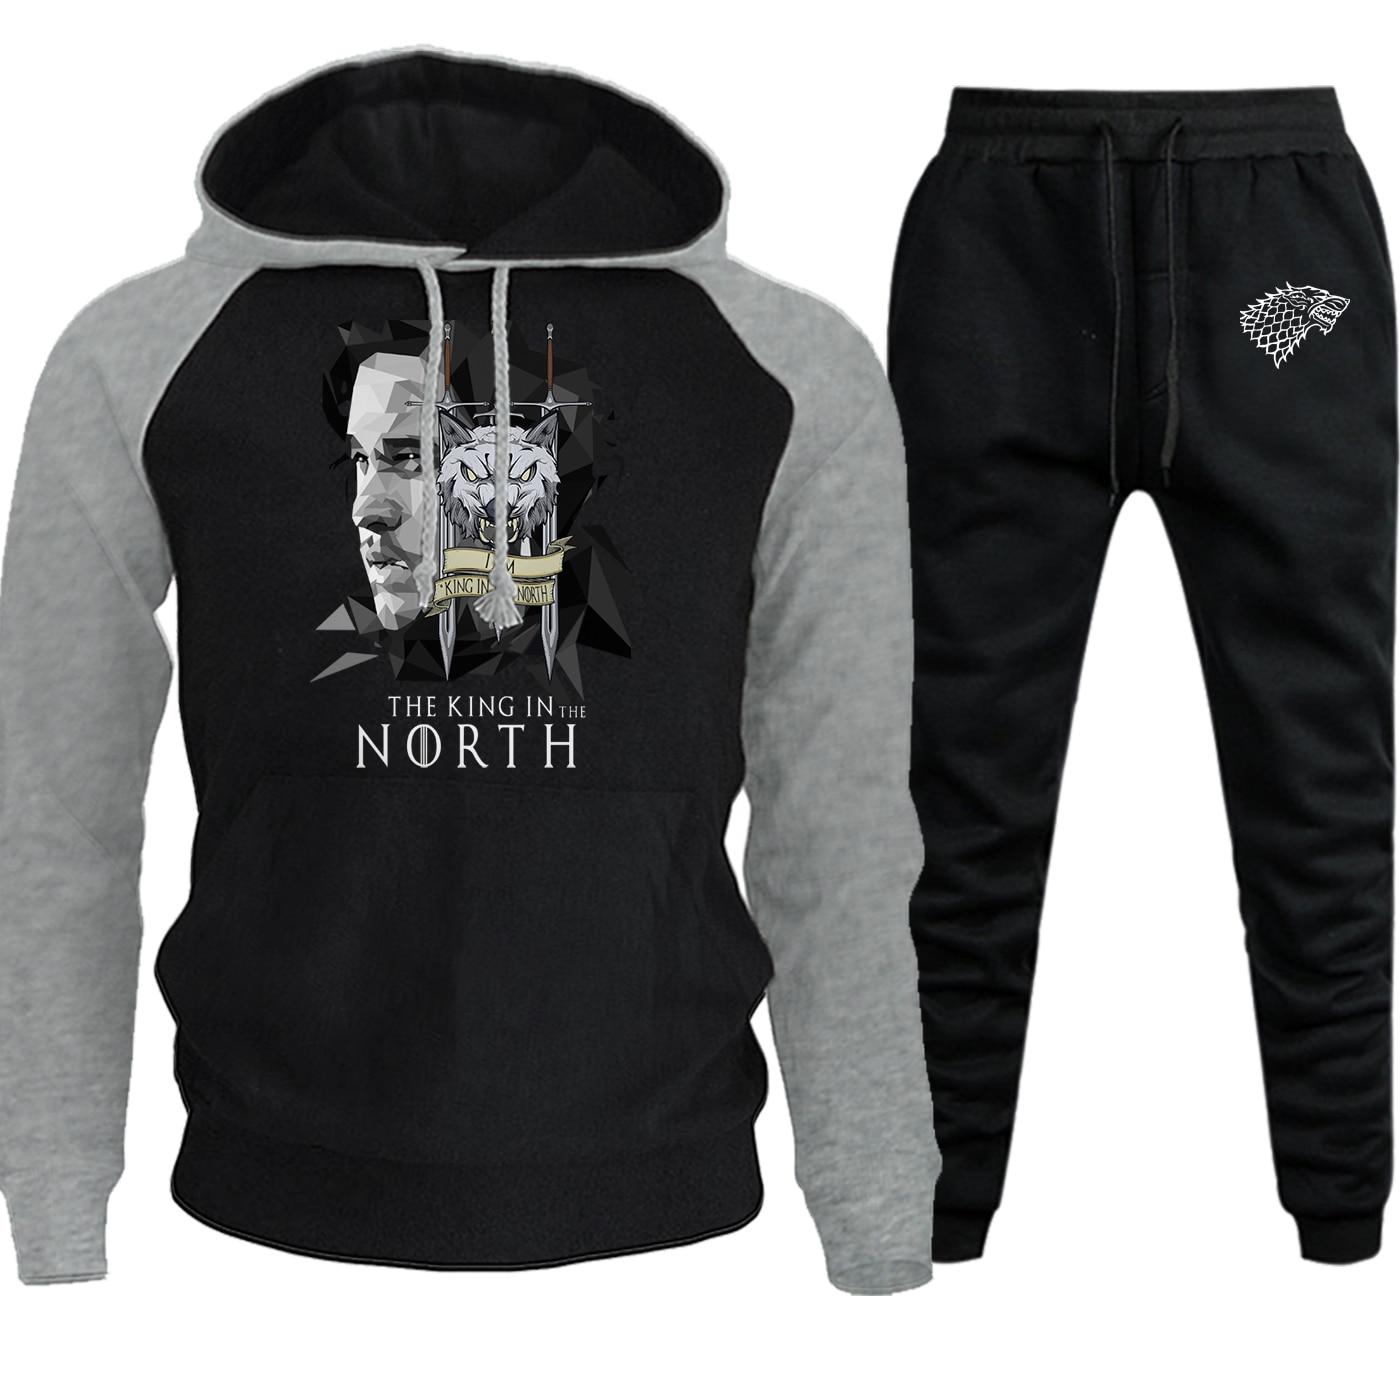 King In The North 2019 Autumn Winter Hoodies Men Raglan Sportswear Game Of Thrones Suit Male Fleece Pullover+Pants 2 Piece Set